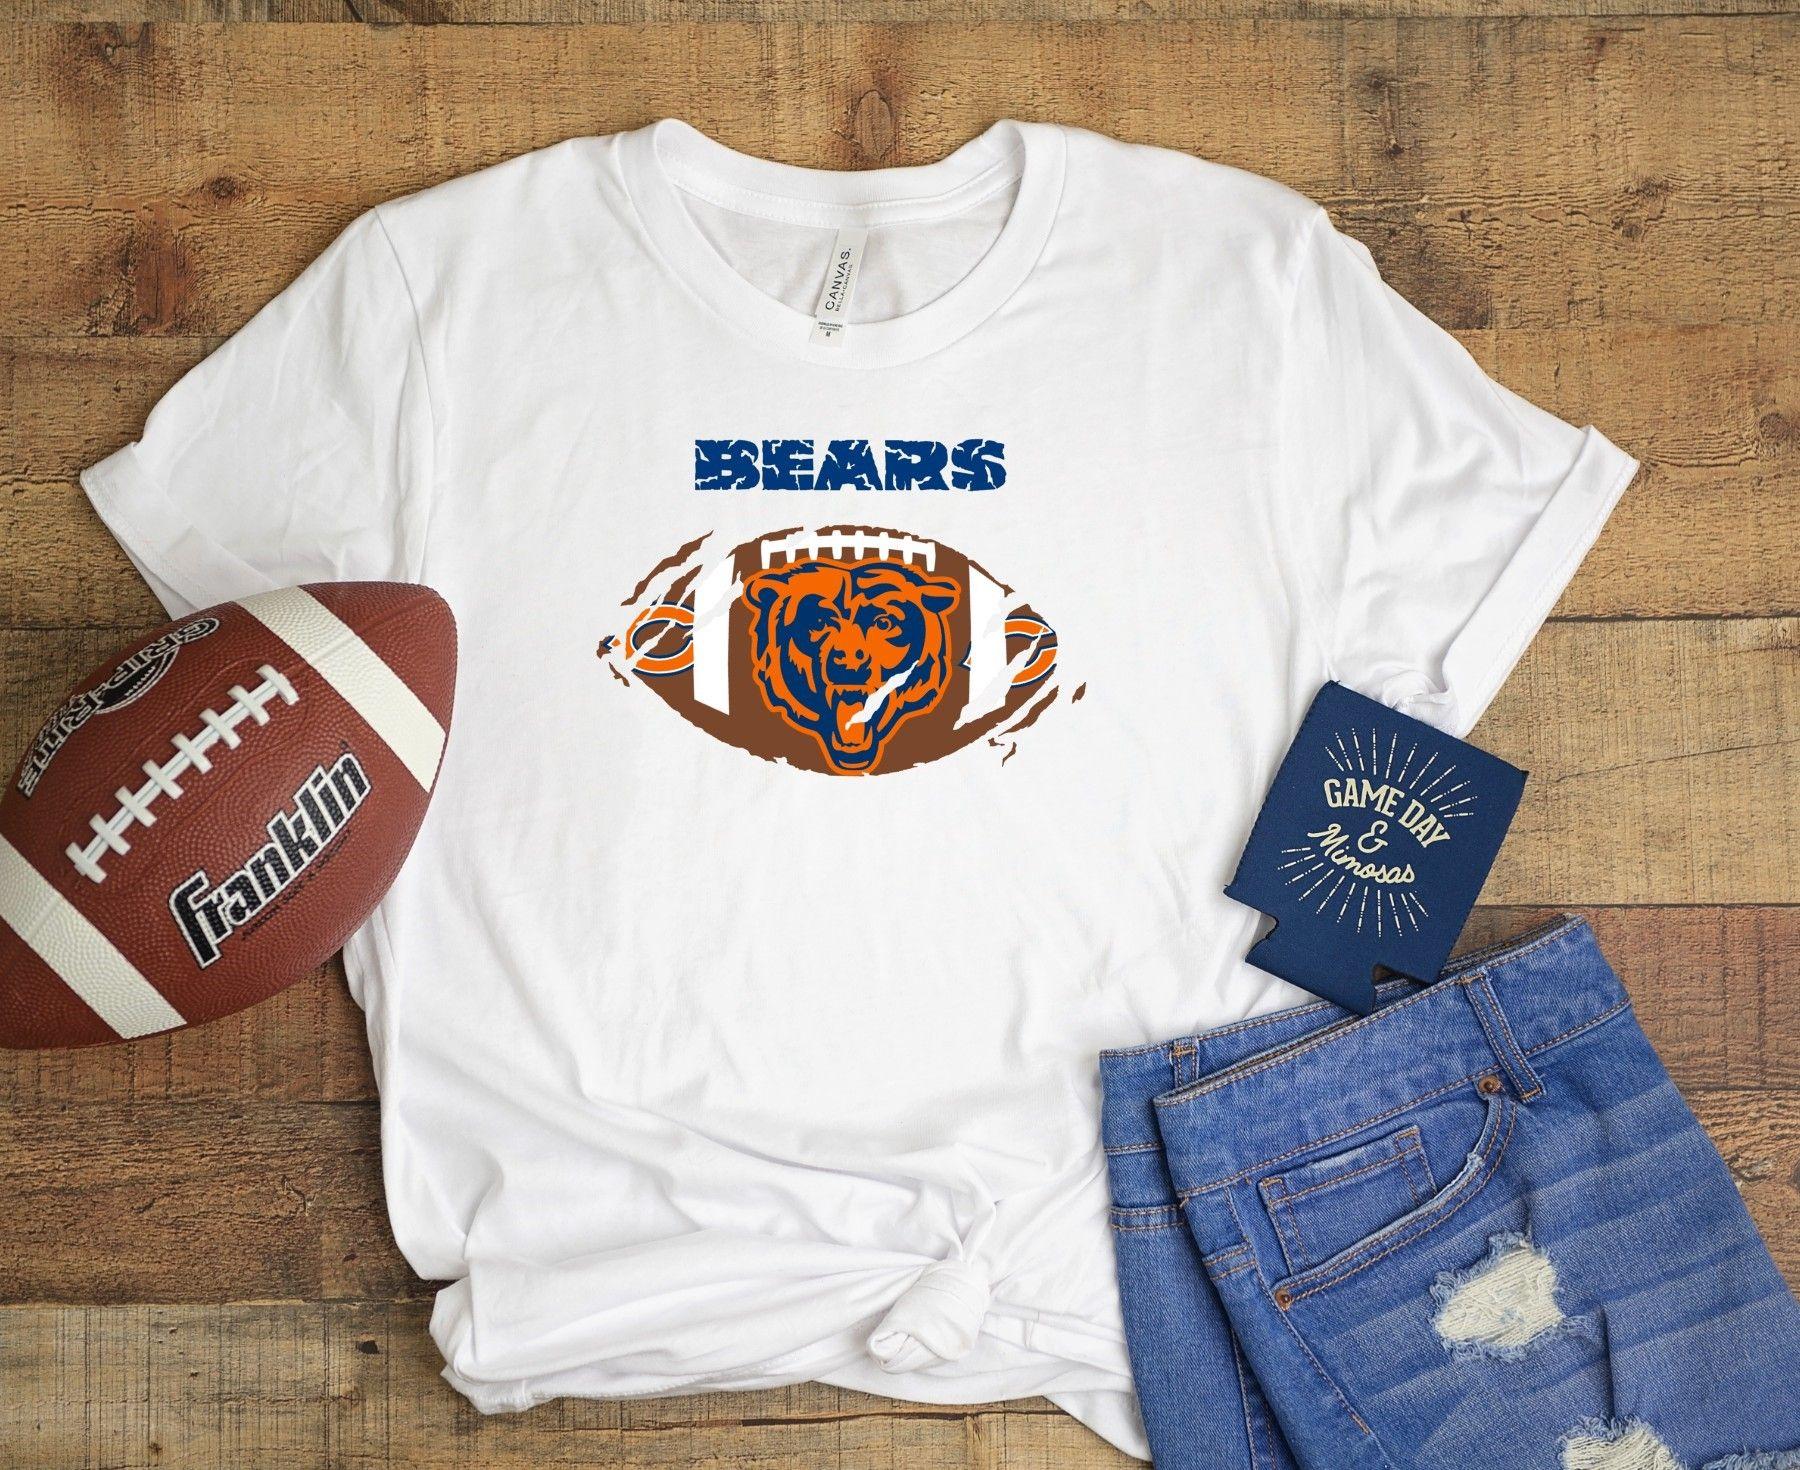 ddd371fc chicago bears shirt - cute chicago bears shirt - womens chicago ...